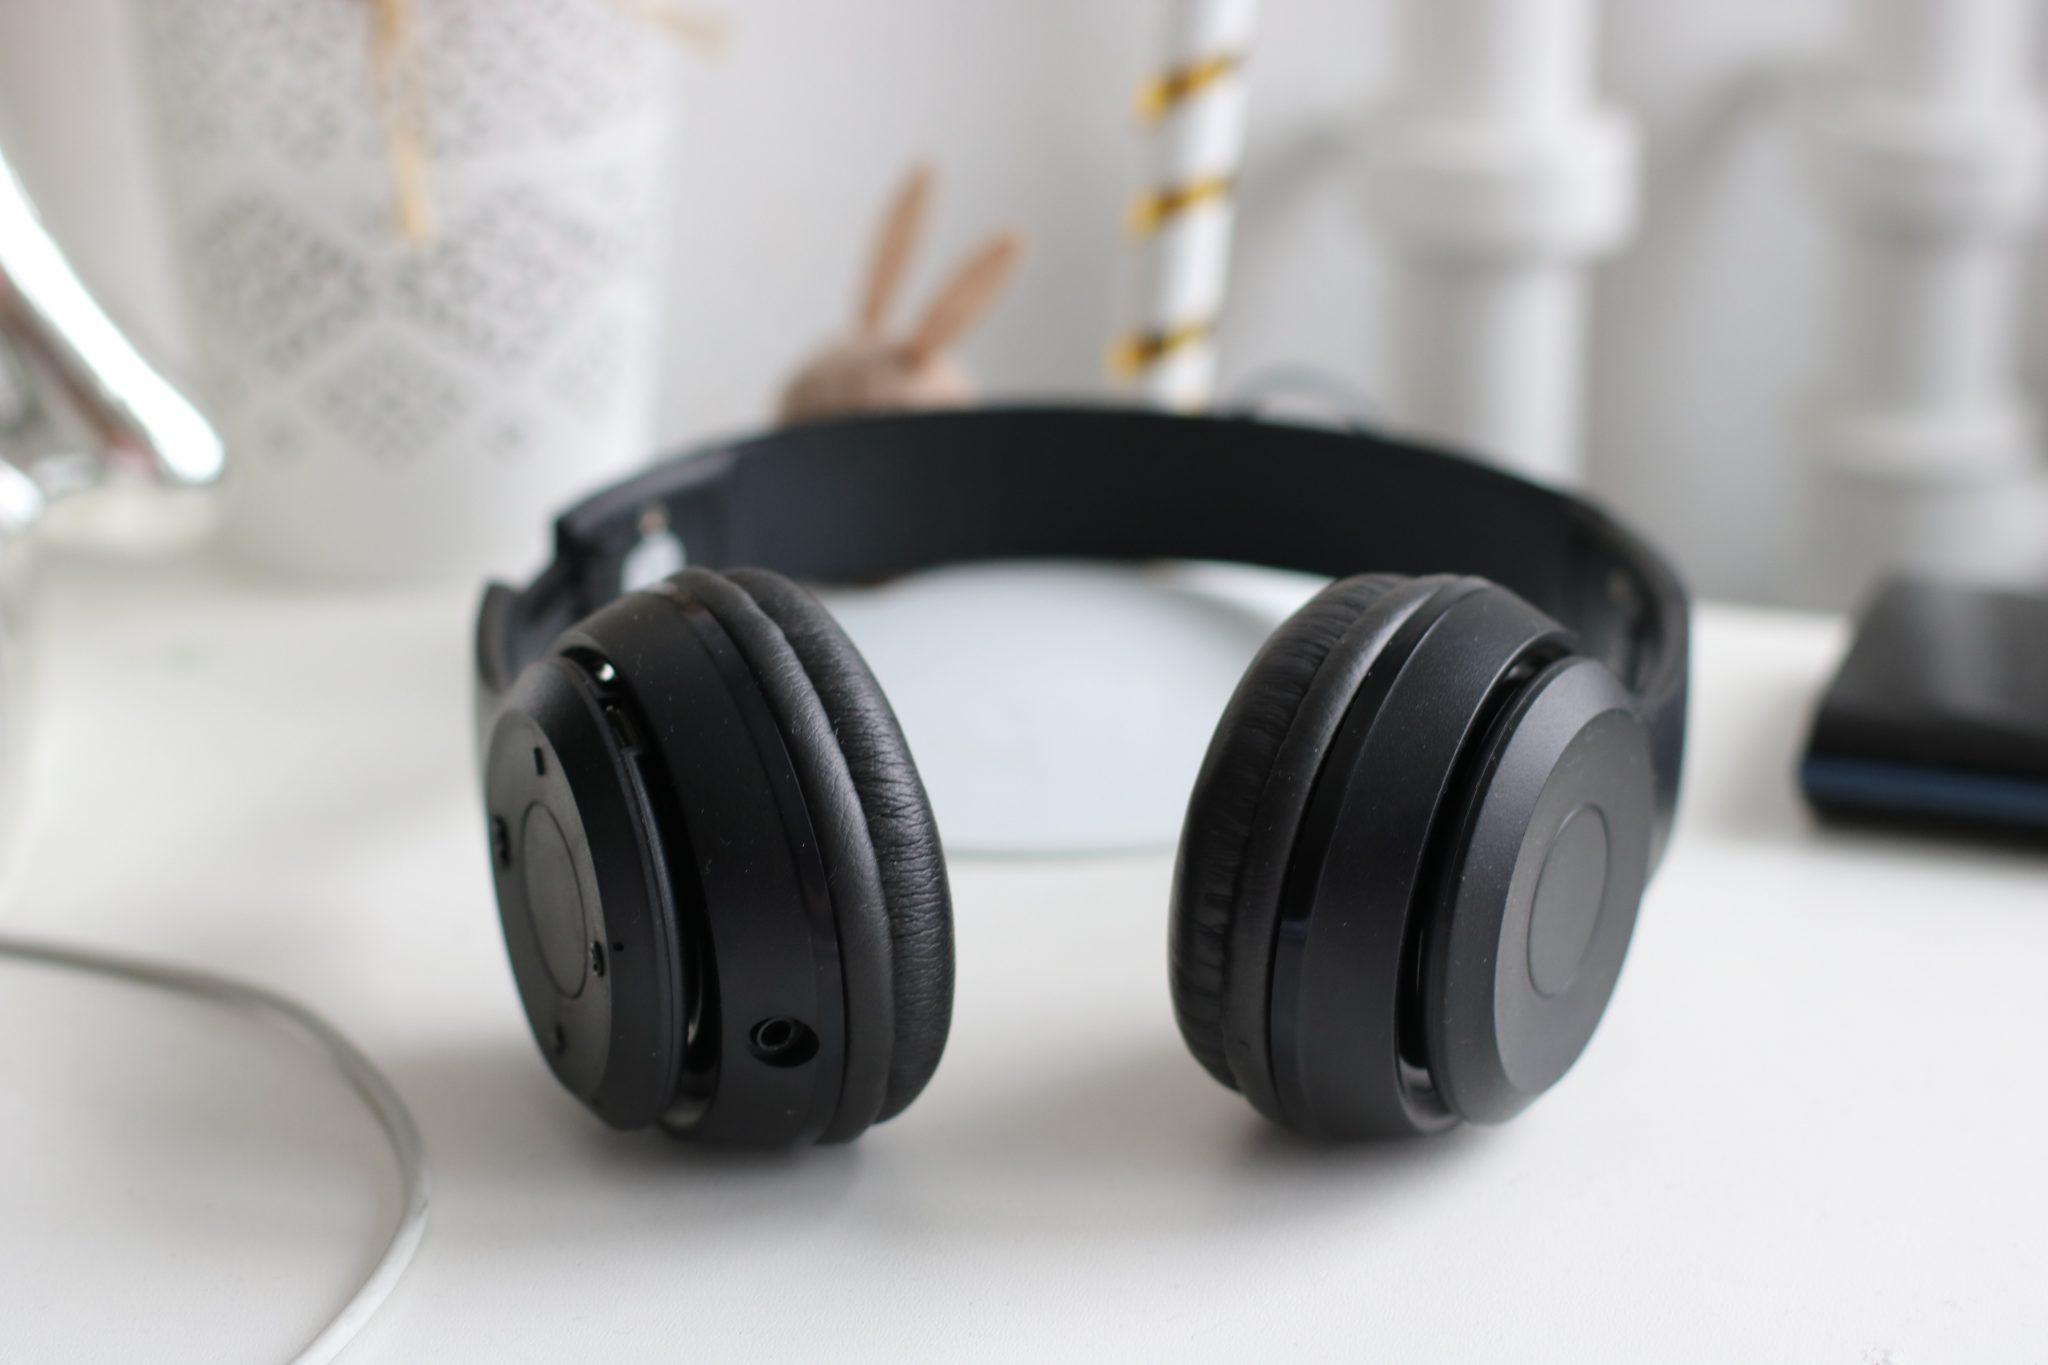 Best Noise Cancelling Headphones Under £200 UK